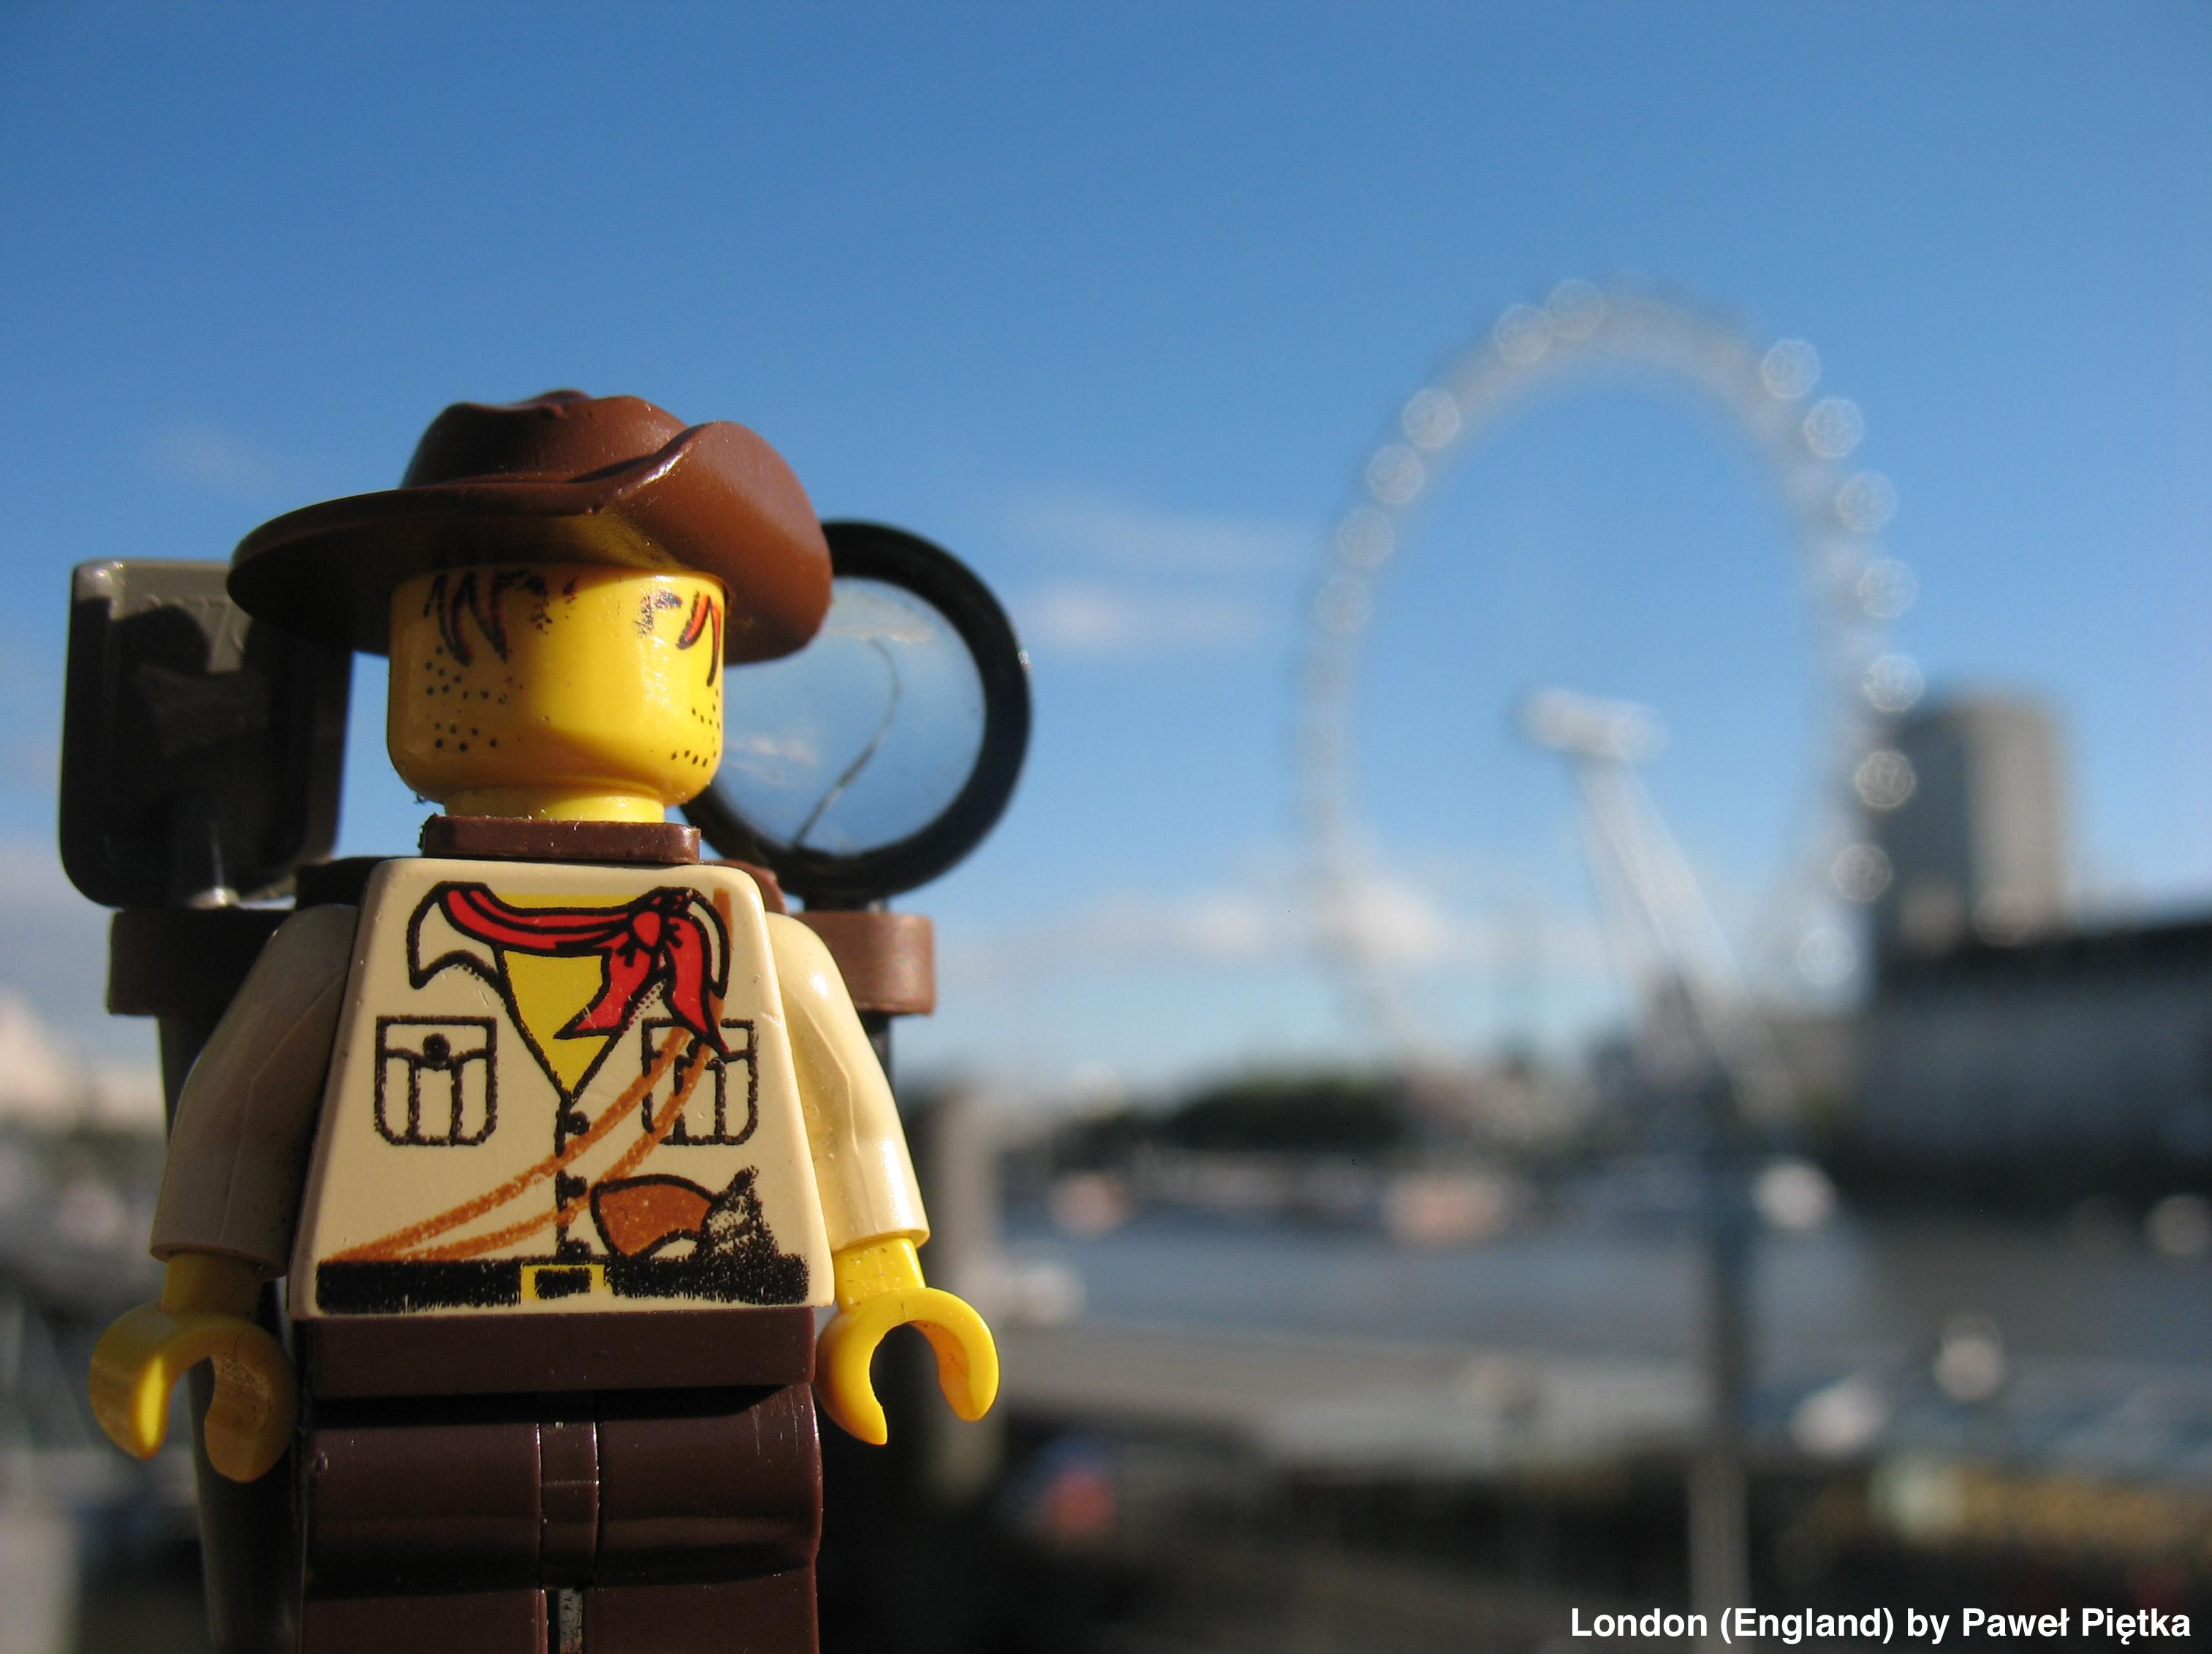 London (England) - London Eye